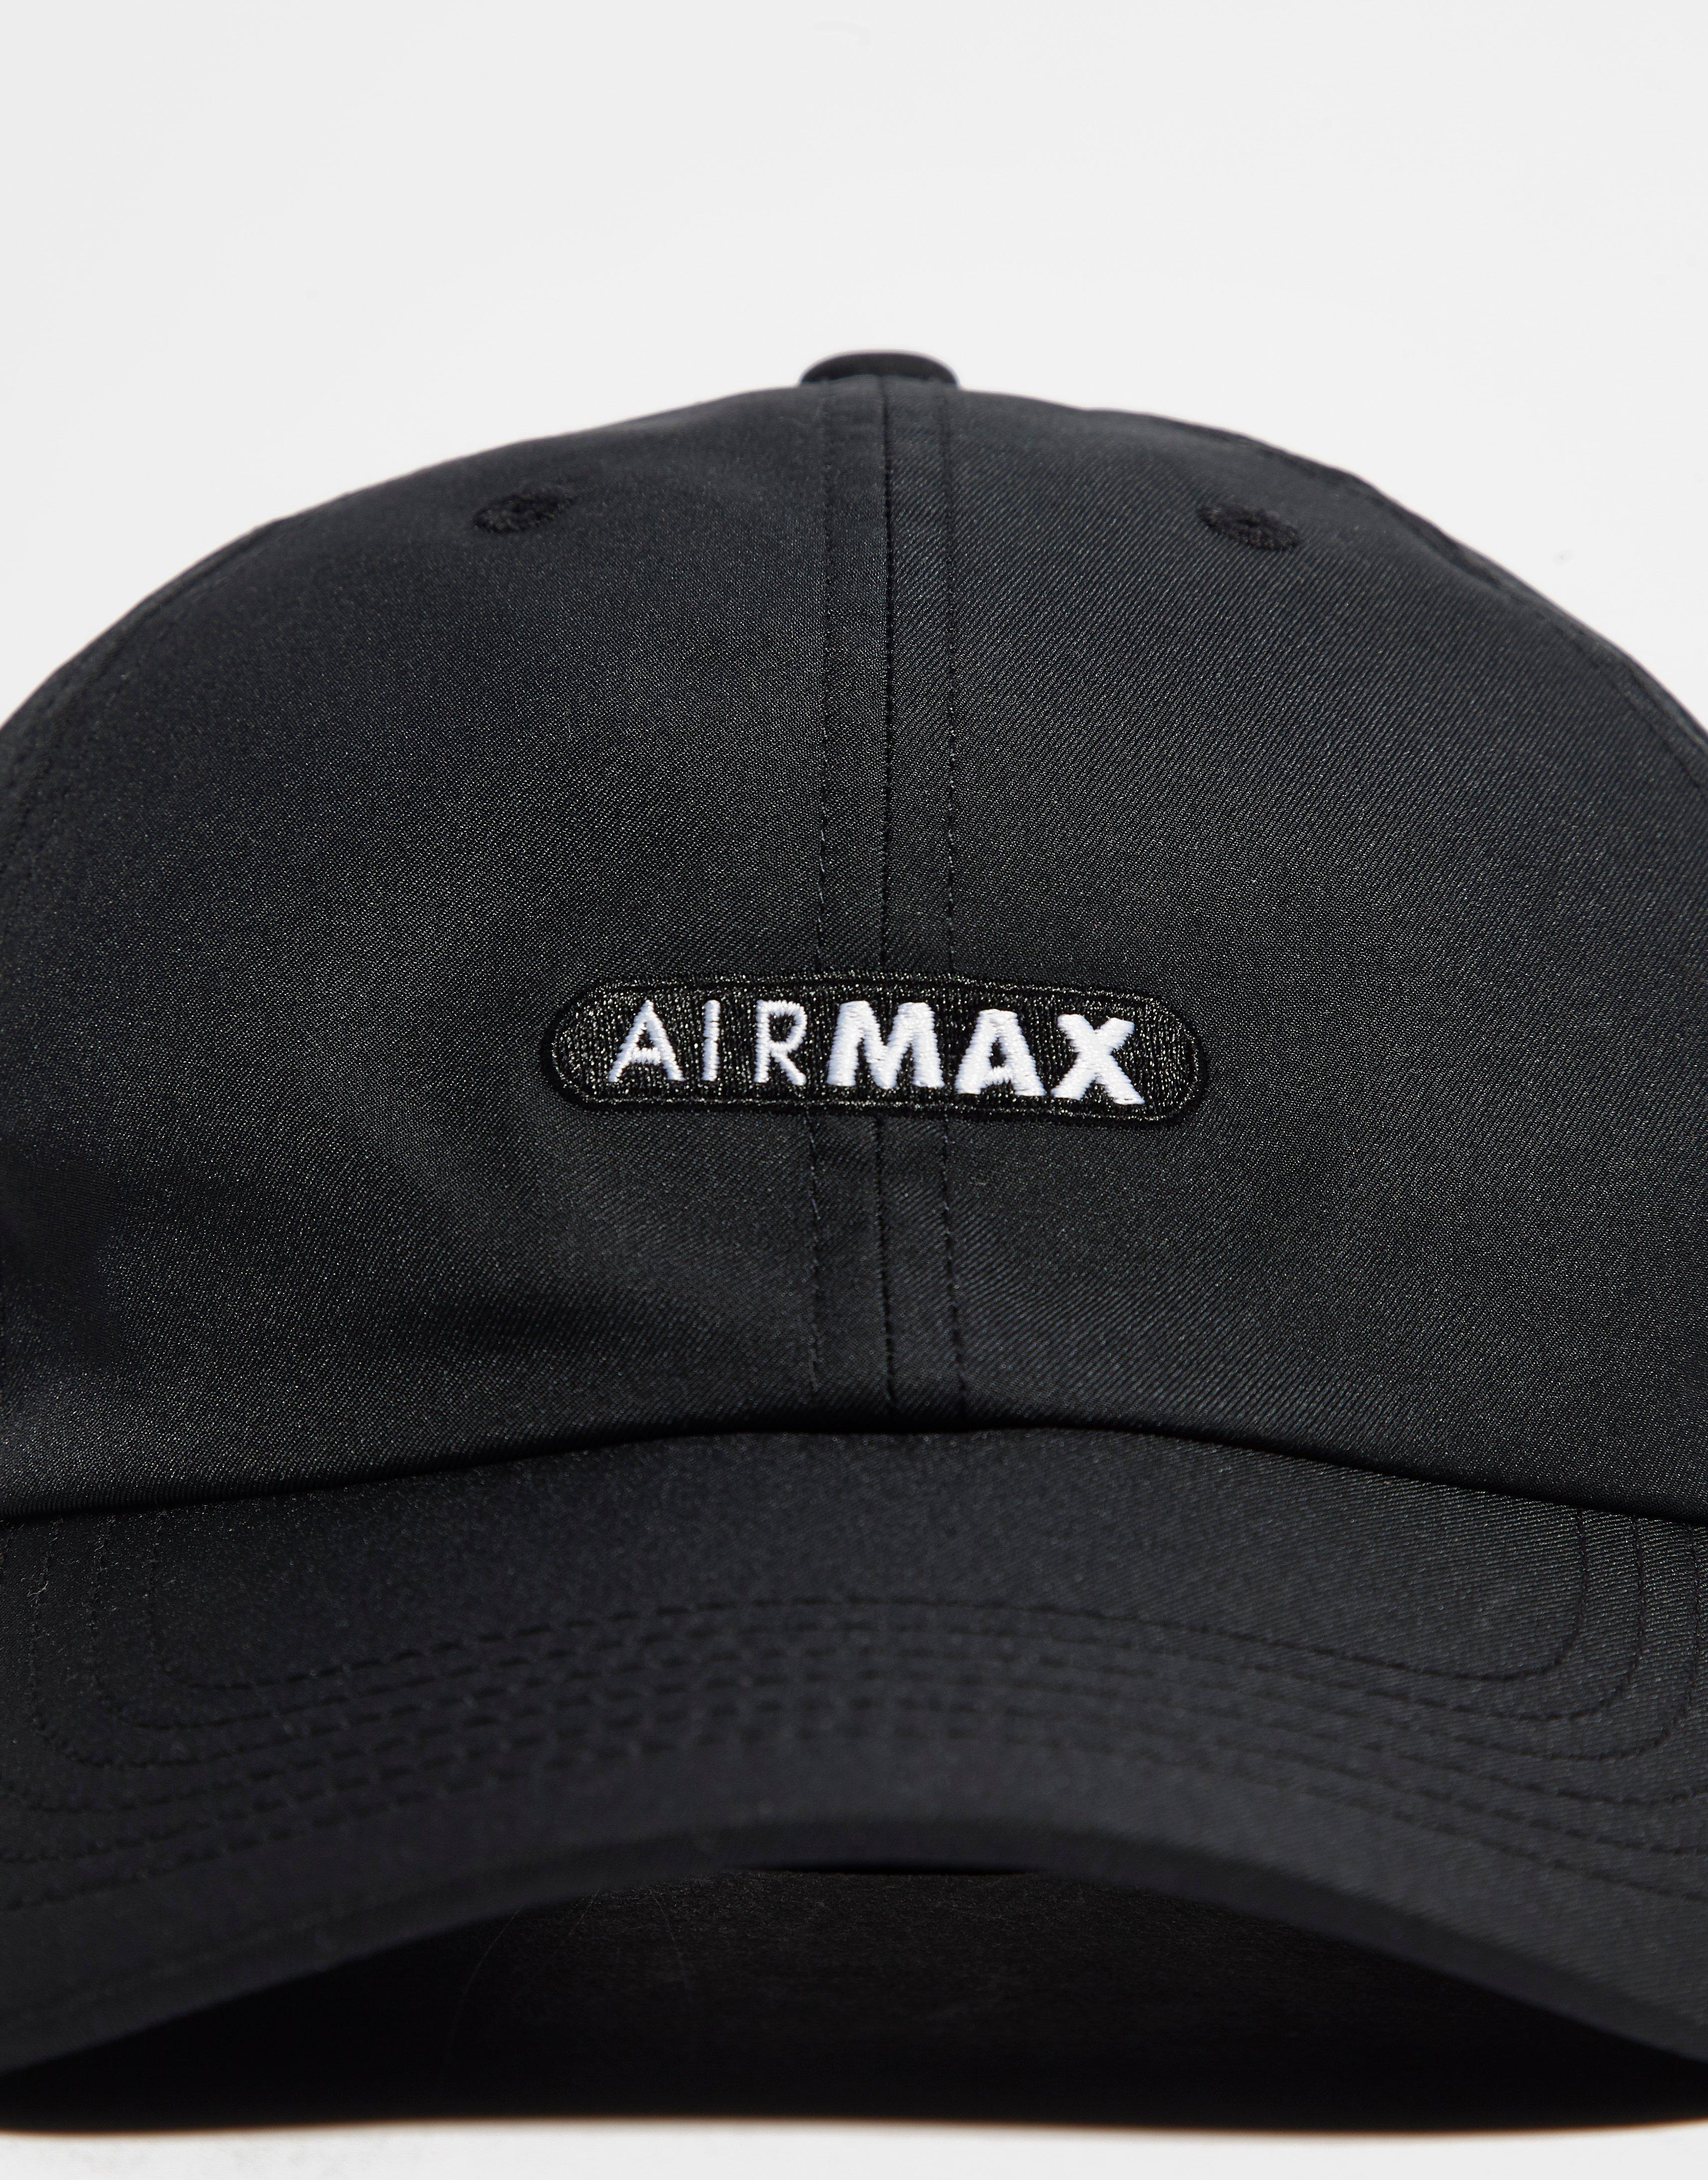 Lyst - Nike Air Max H86 Cap in Black for Men 0c338a671137